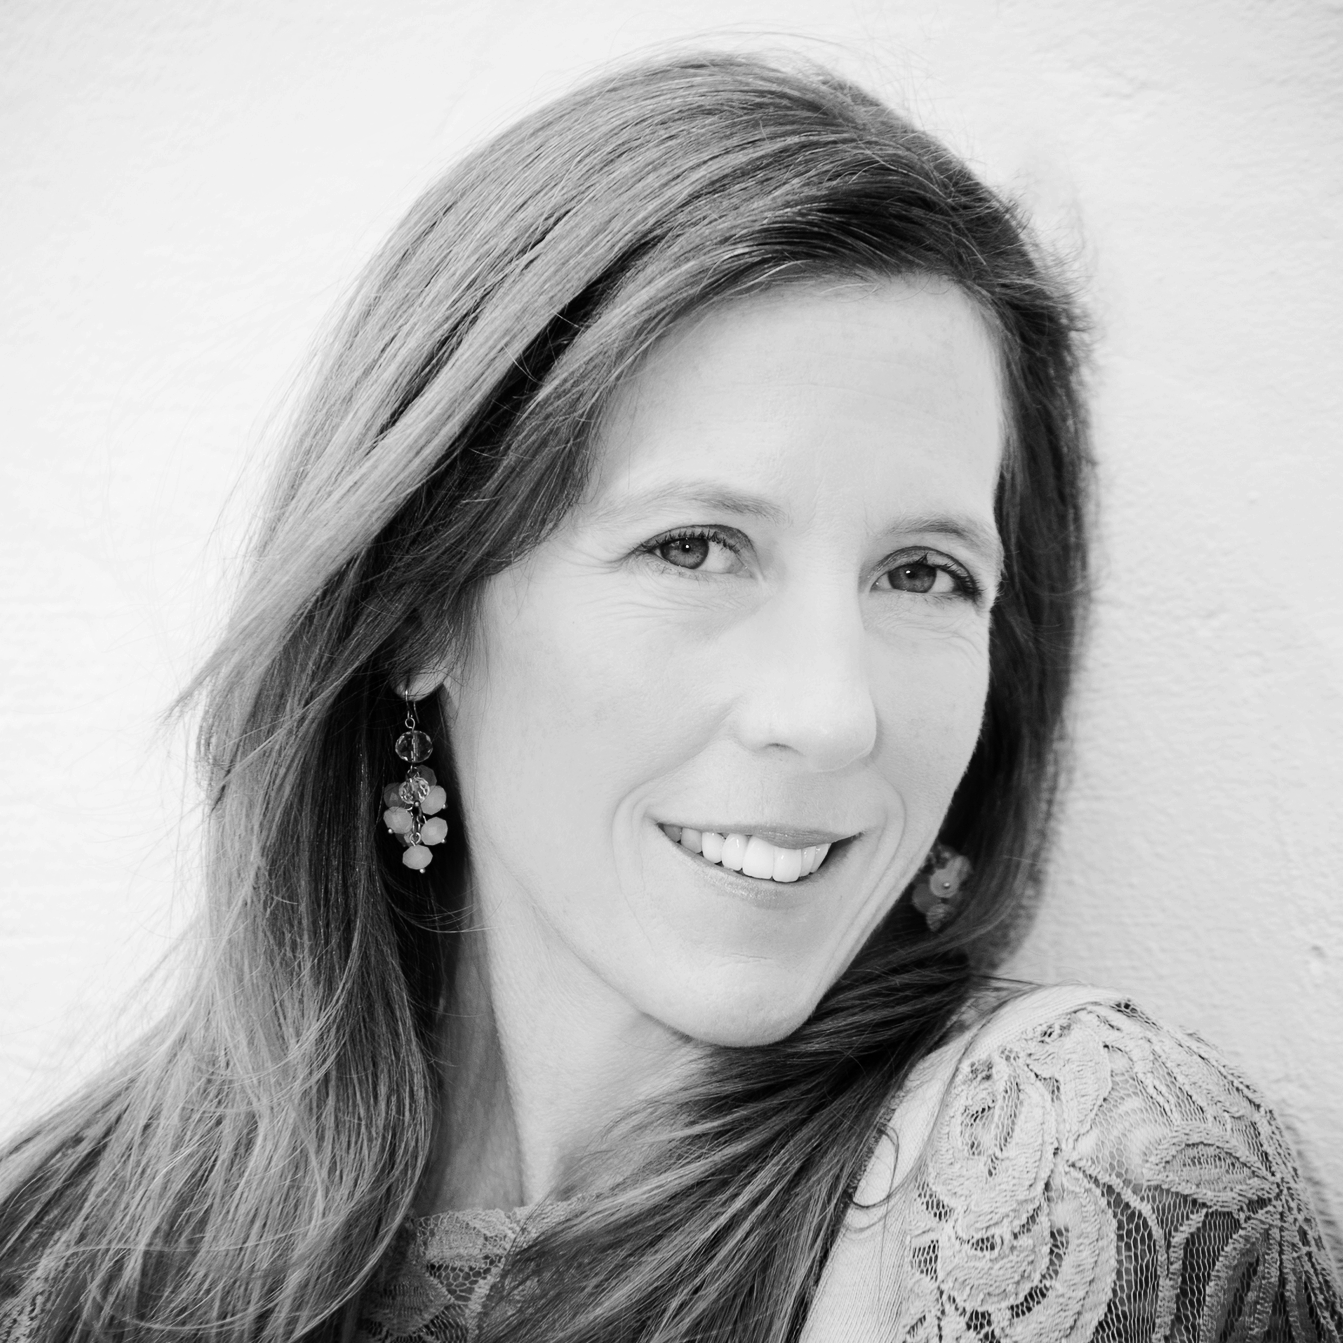 Leah Macdonald - Edgy and Artistic